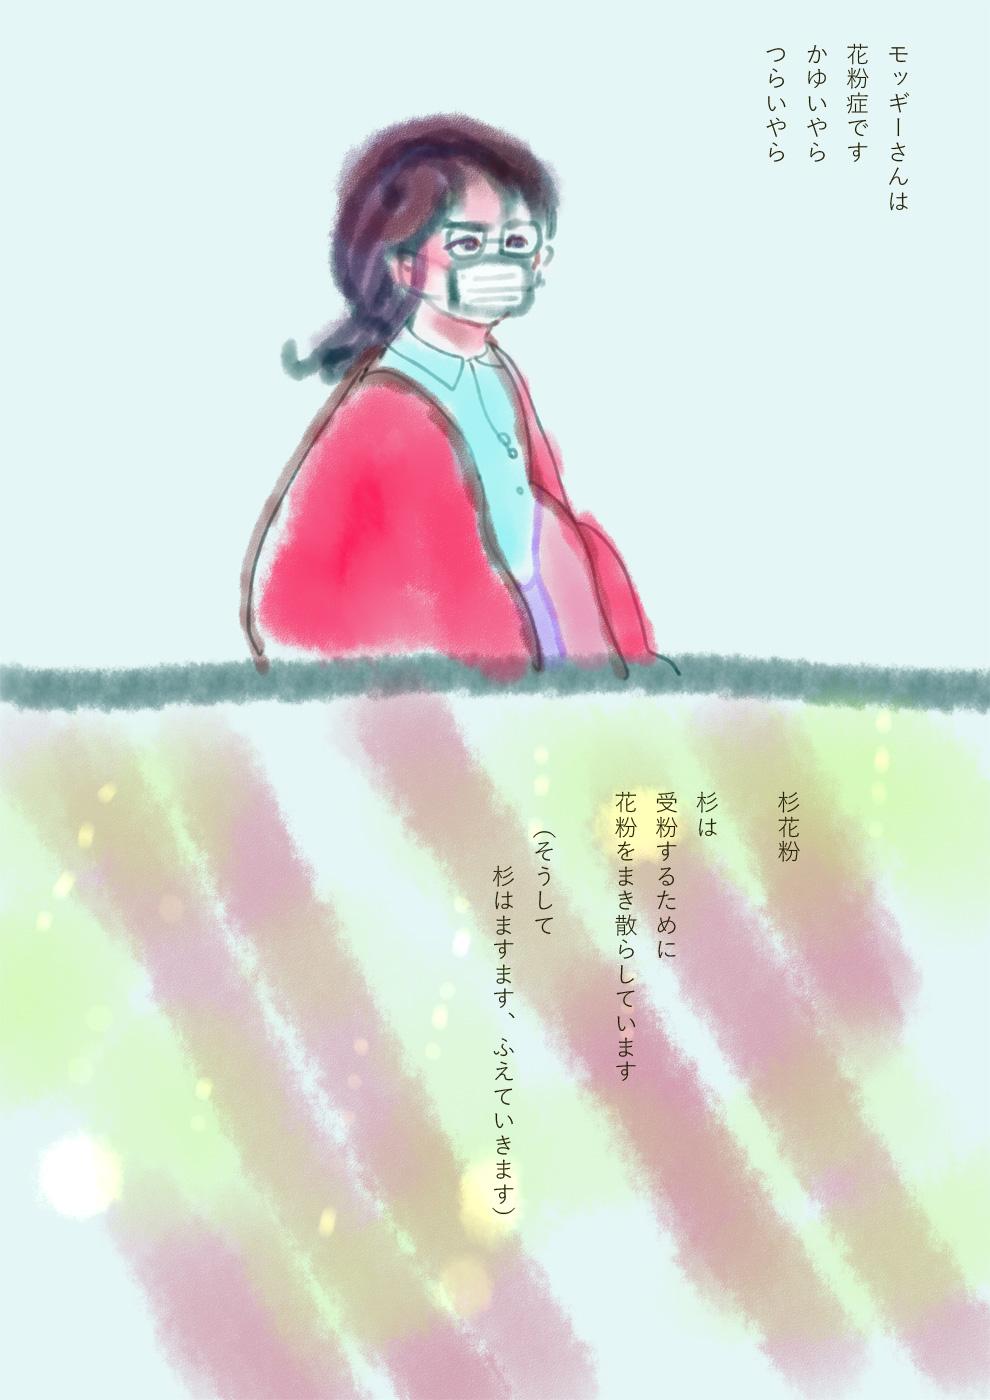 http://ahito.com/comic/ehon/kamiuta/img/2018/20180320_2/01.jpg